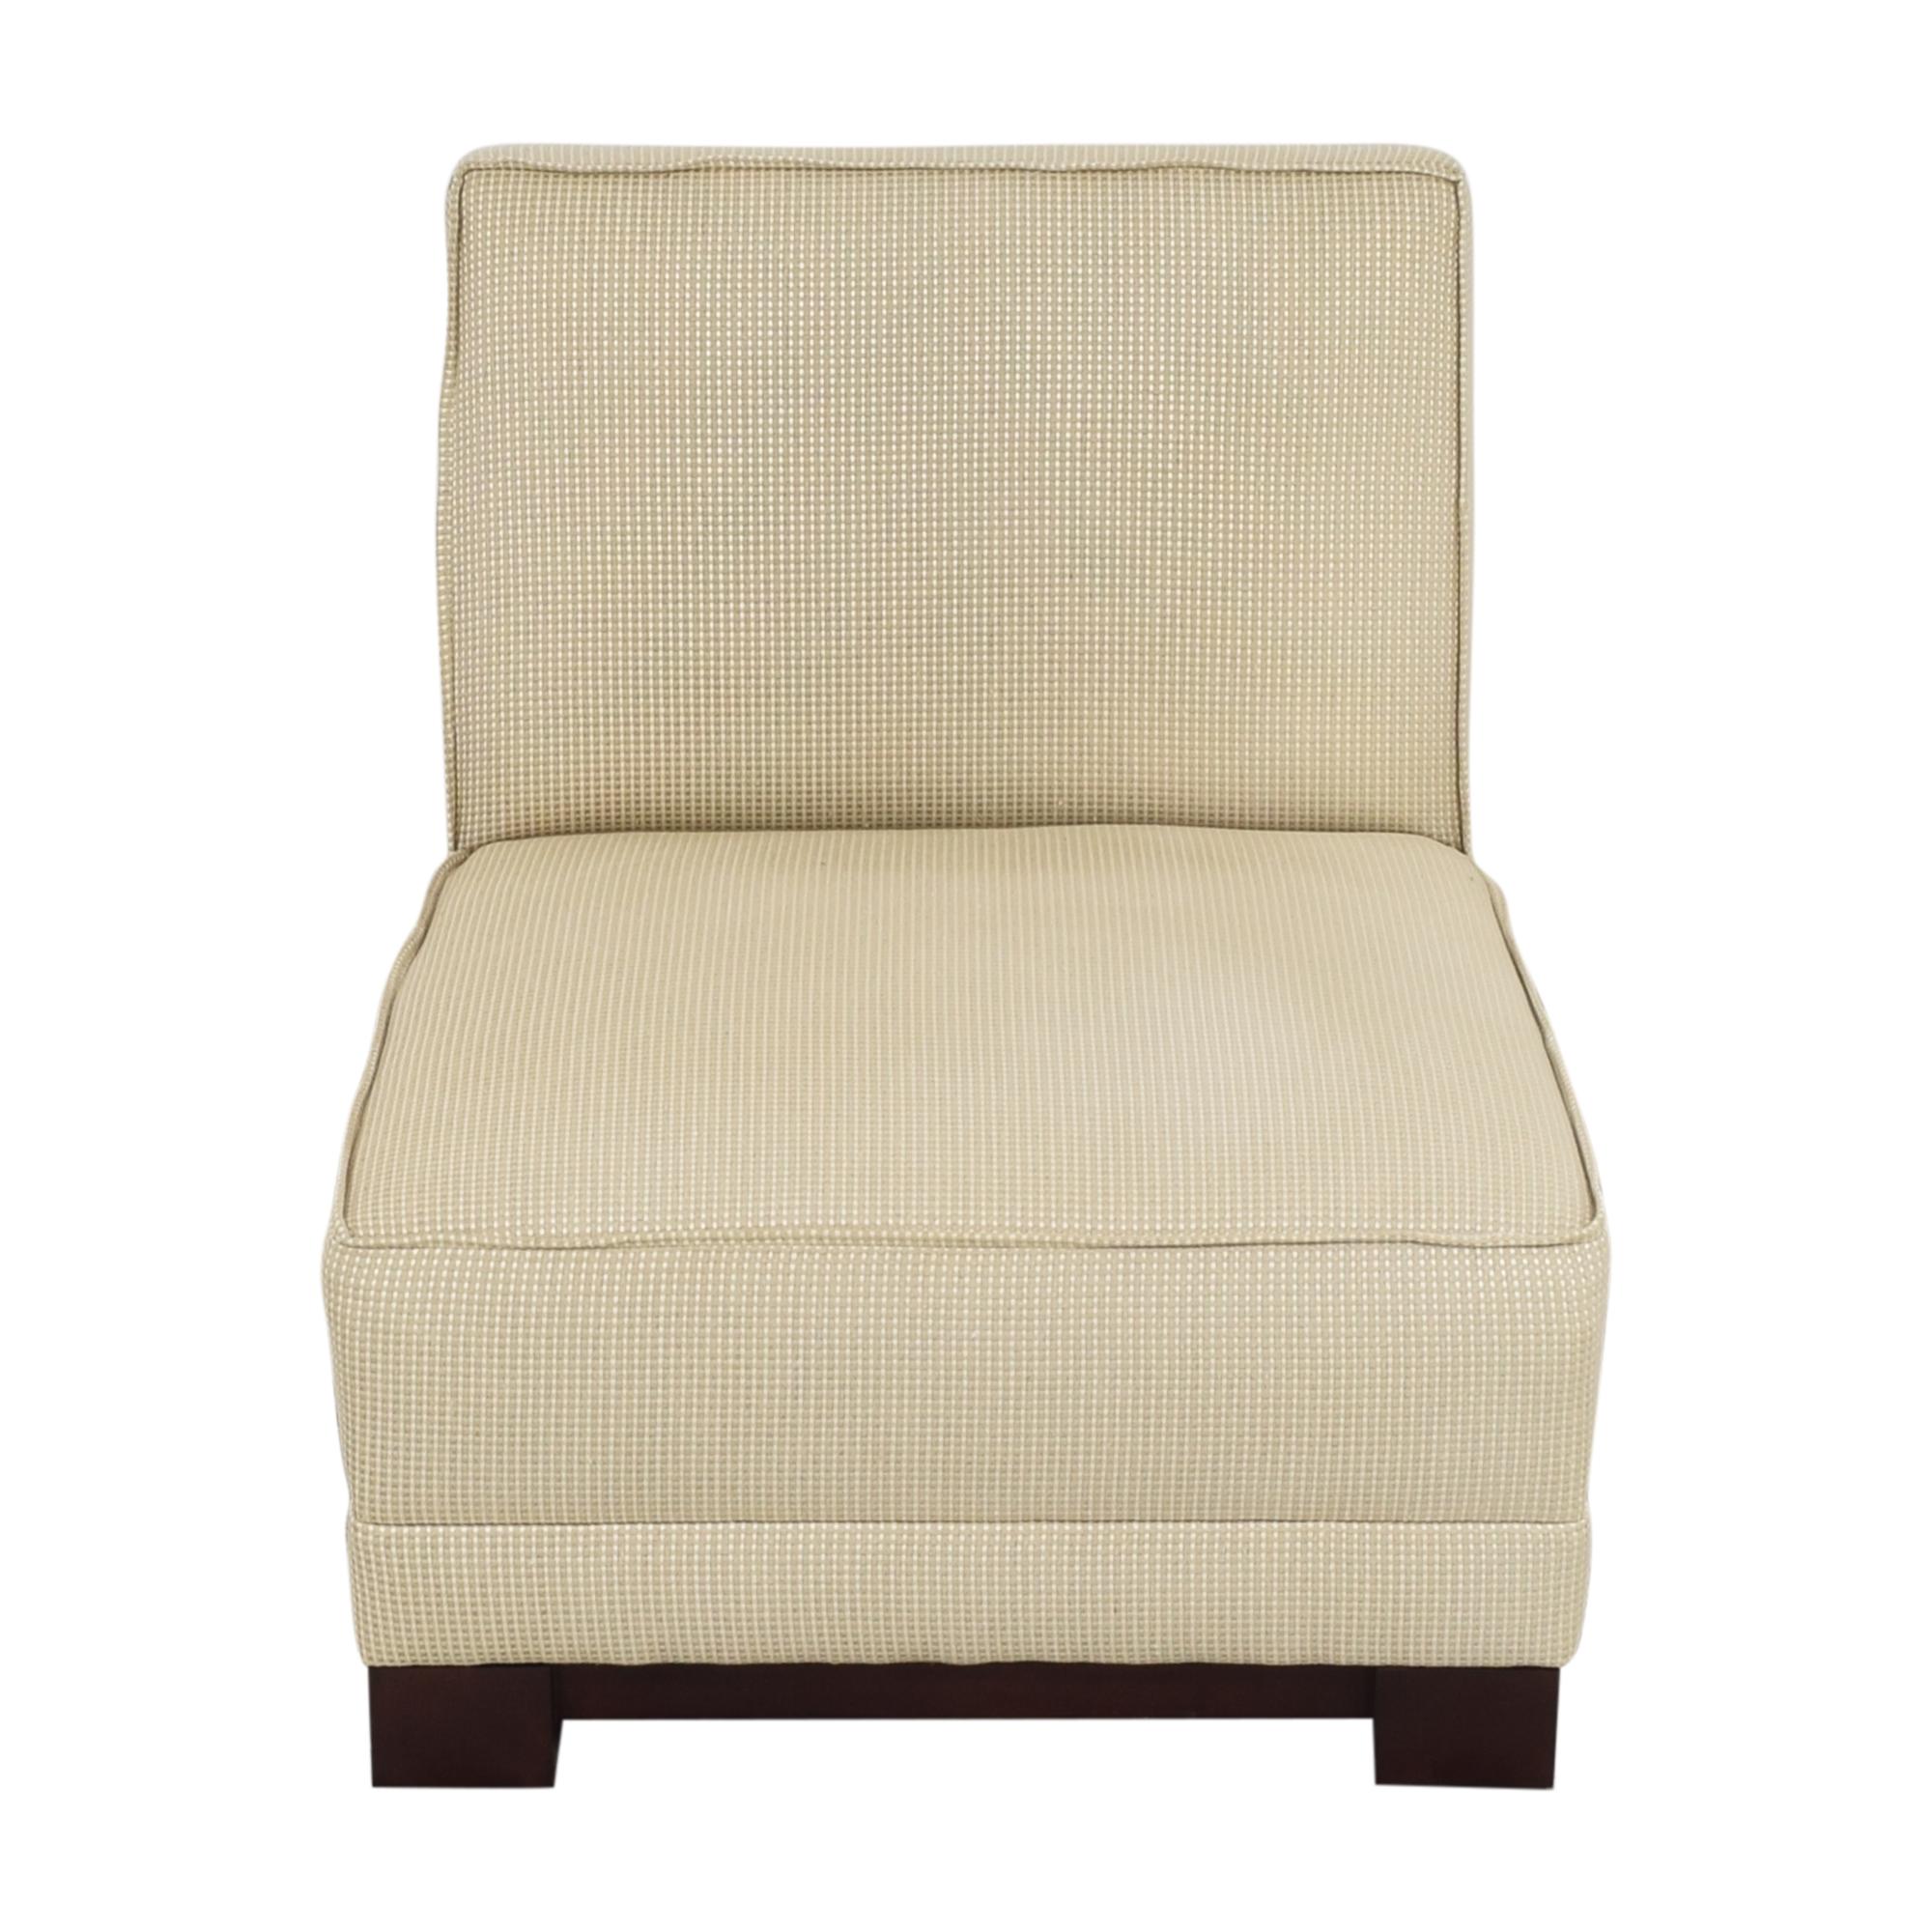 Ralph Lauren Home Ralph Lauren Home Hasley Slipper Chair with Ottoman for sale